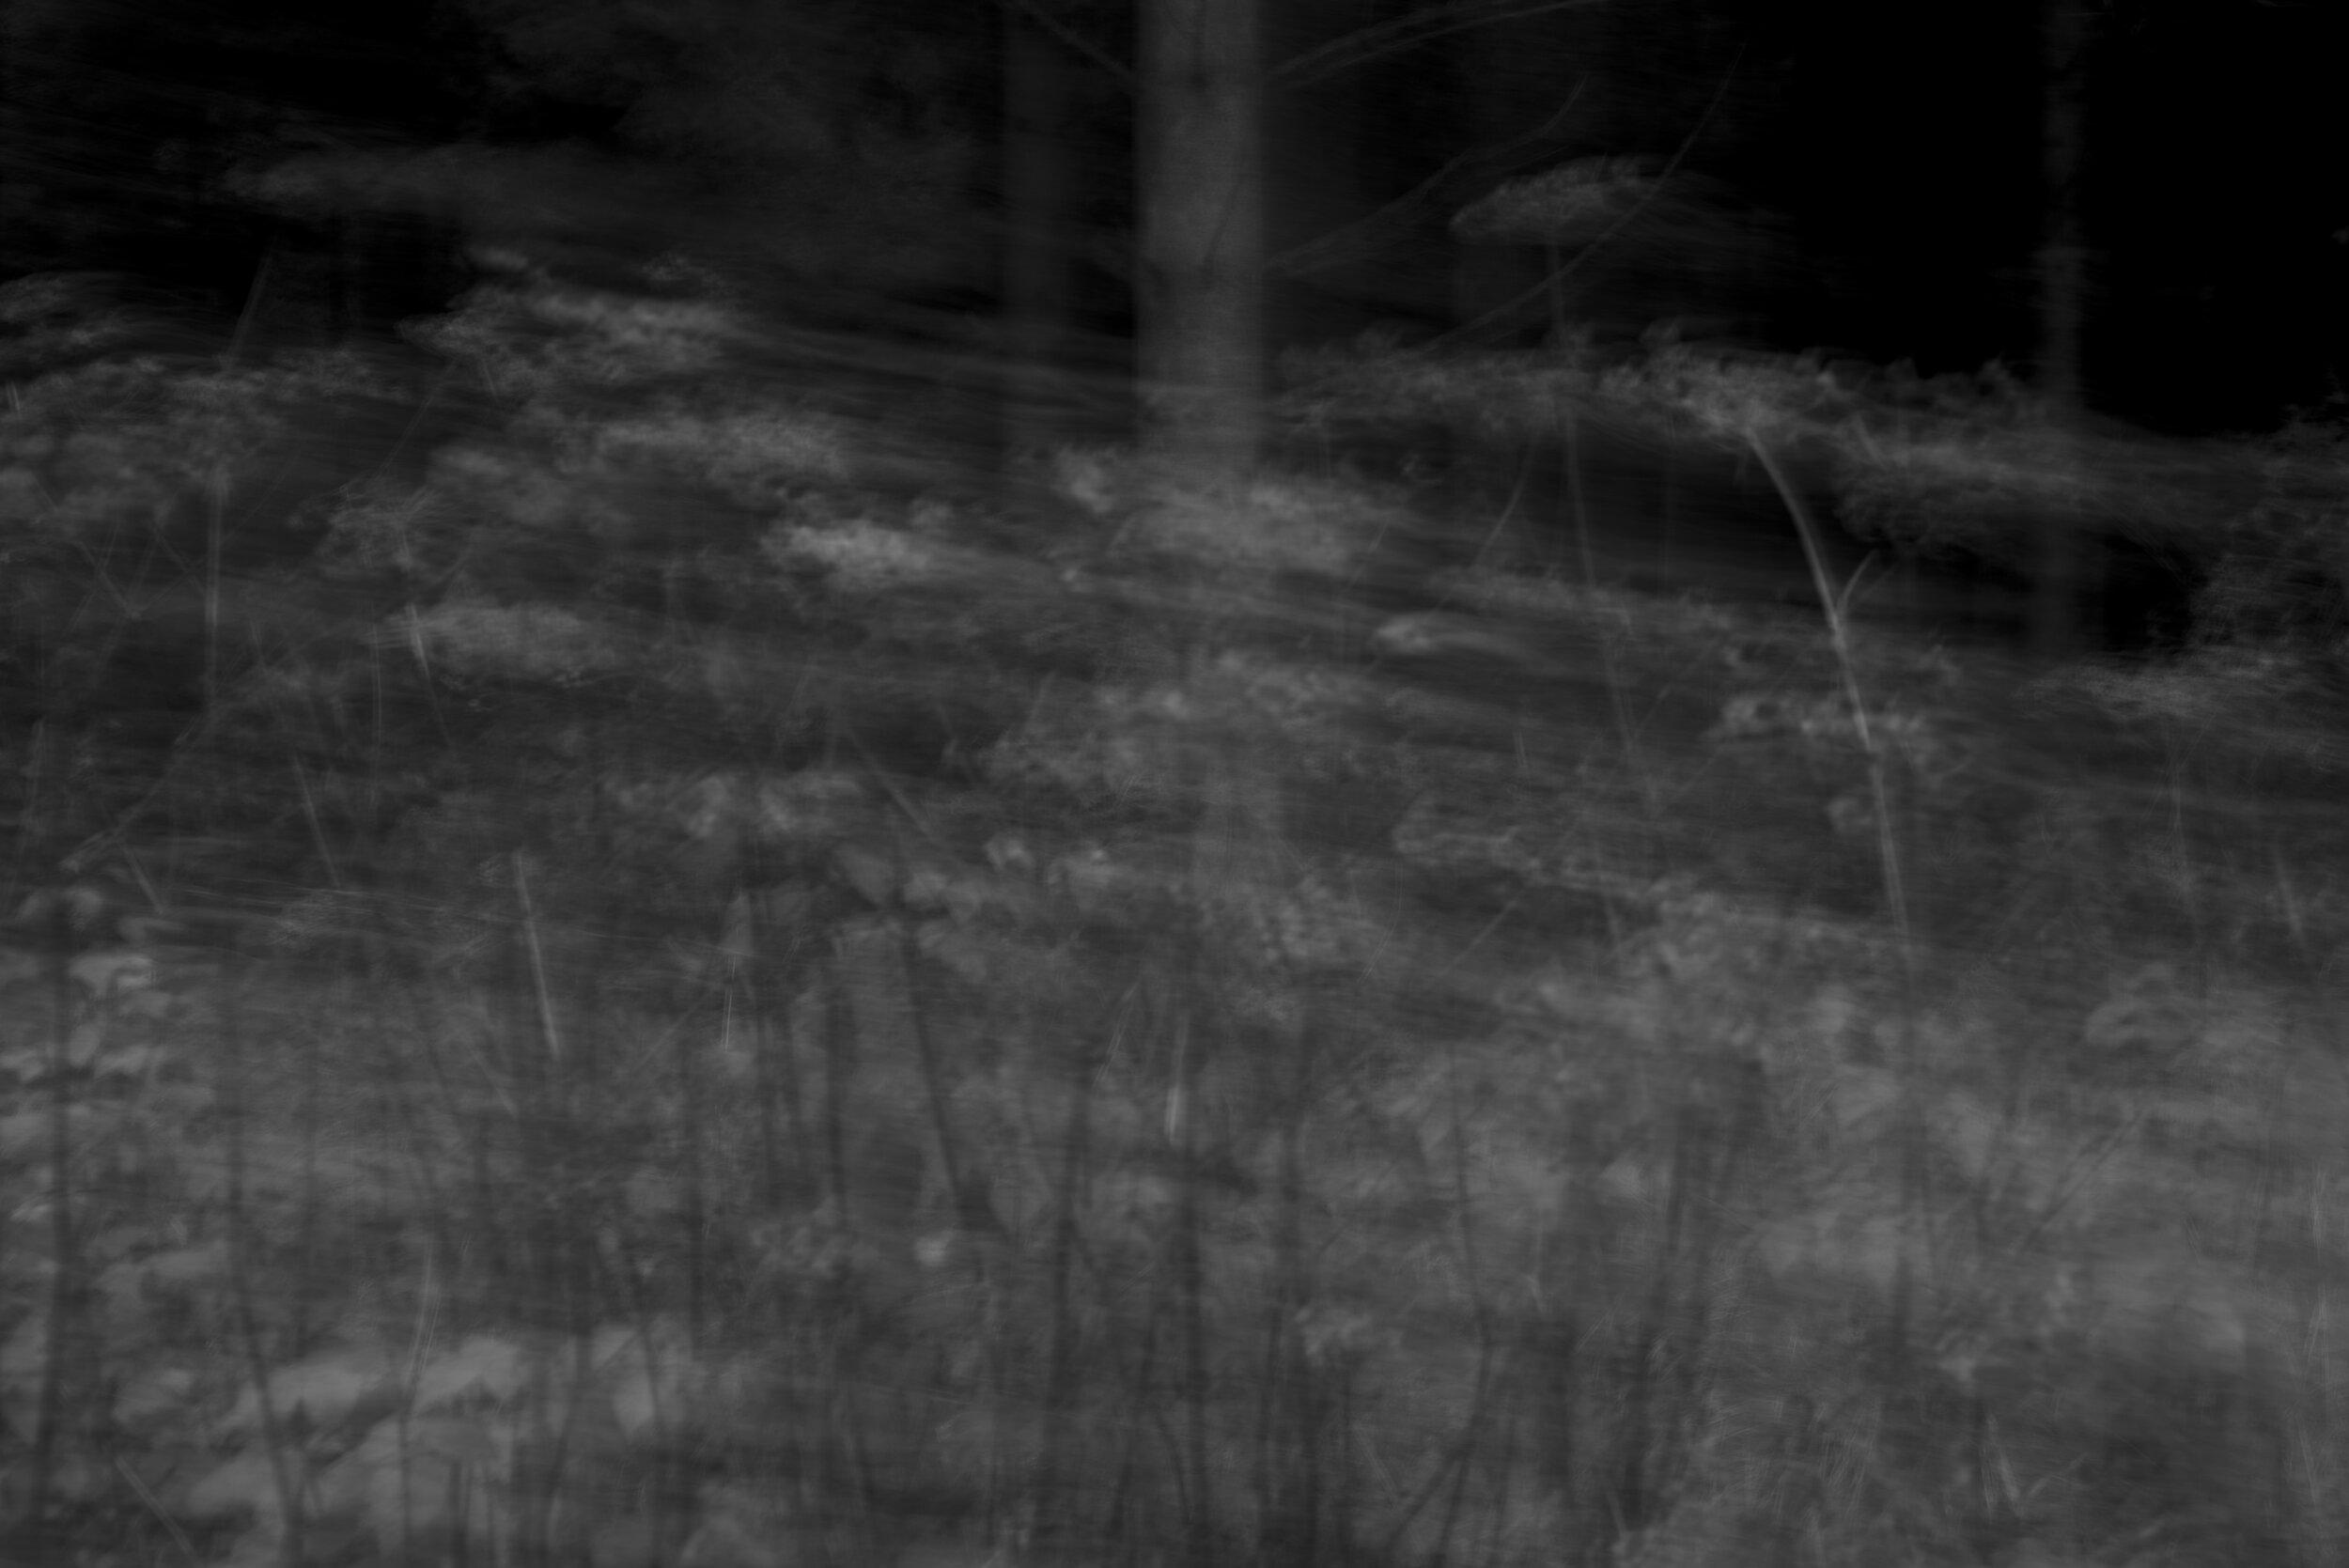 Forest bw 2019-1.jpg